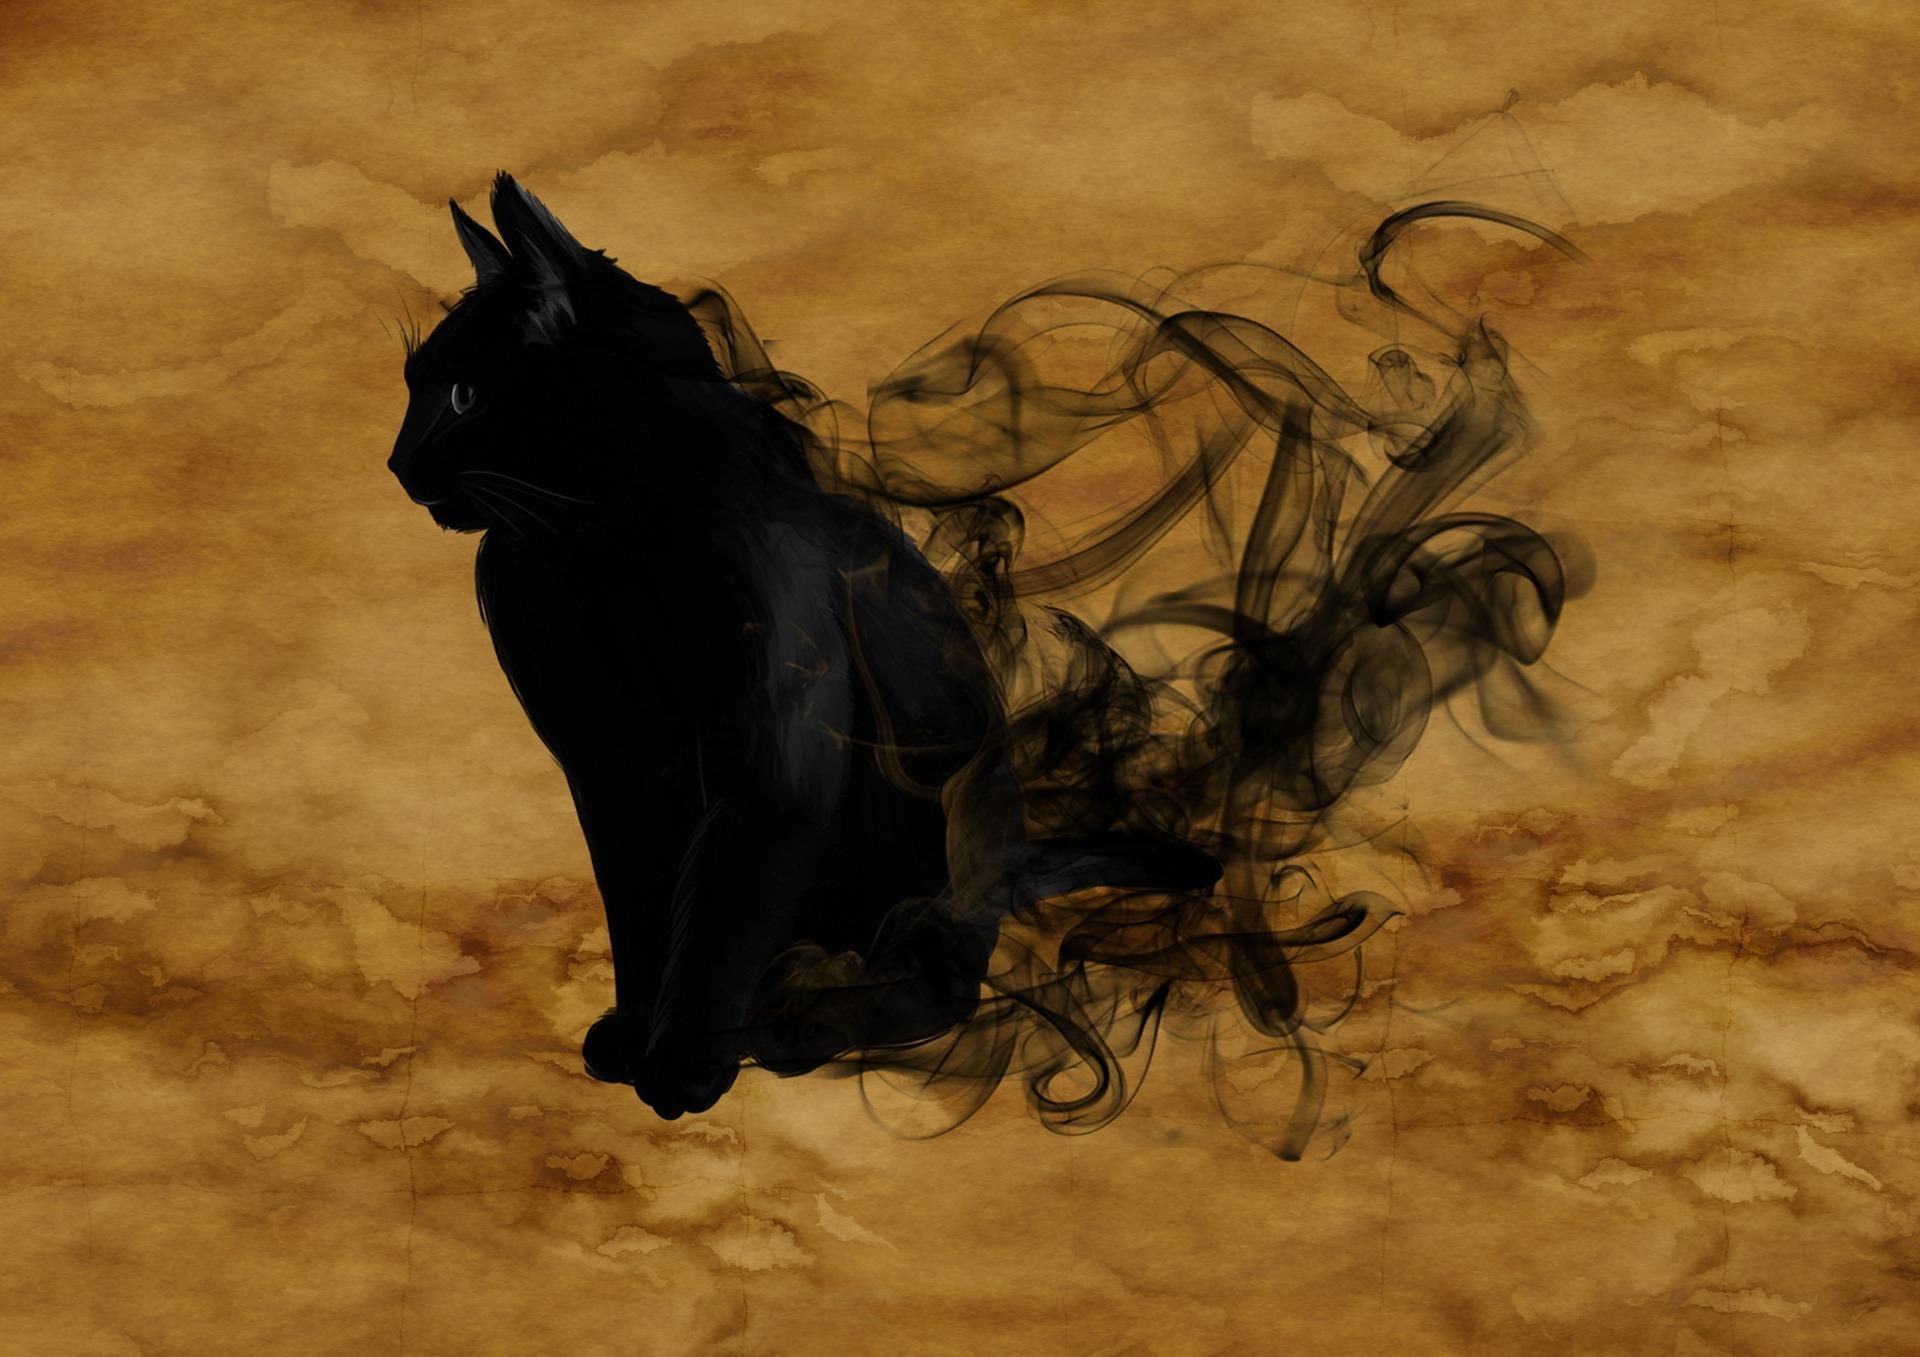 cat-1002850_1920.jpg